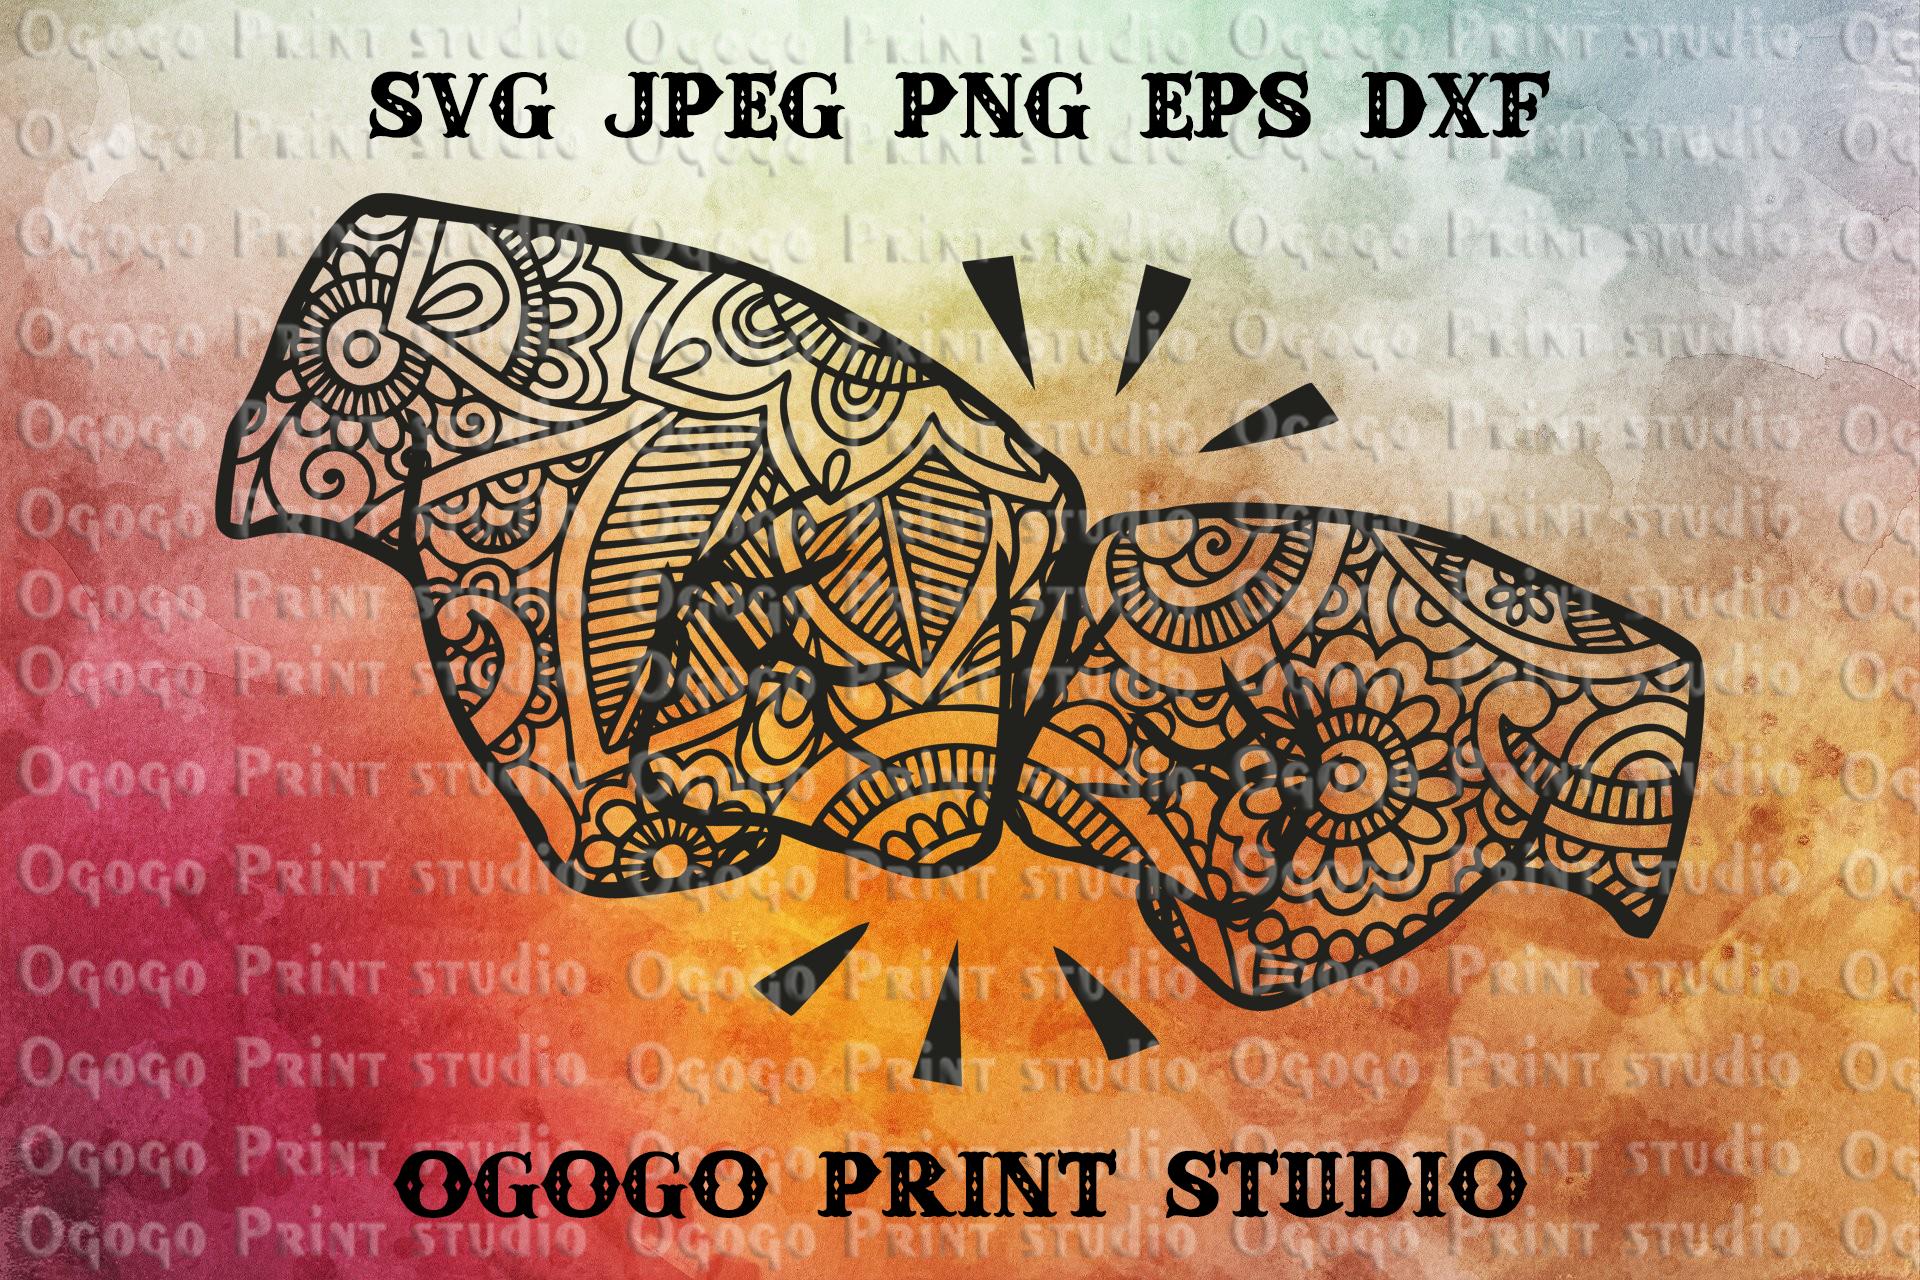 Best Friend Svg, Fist Bump Svg, Zentangle SVG, Mandala svg example image 1